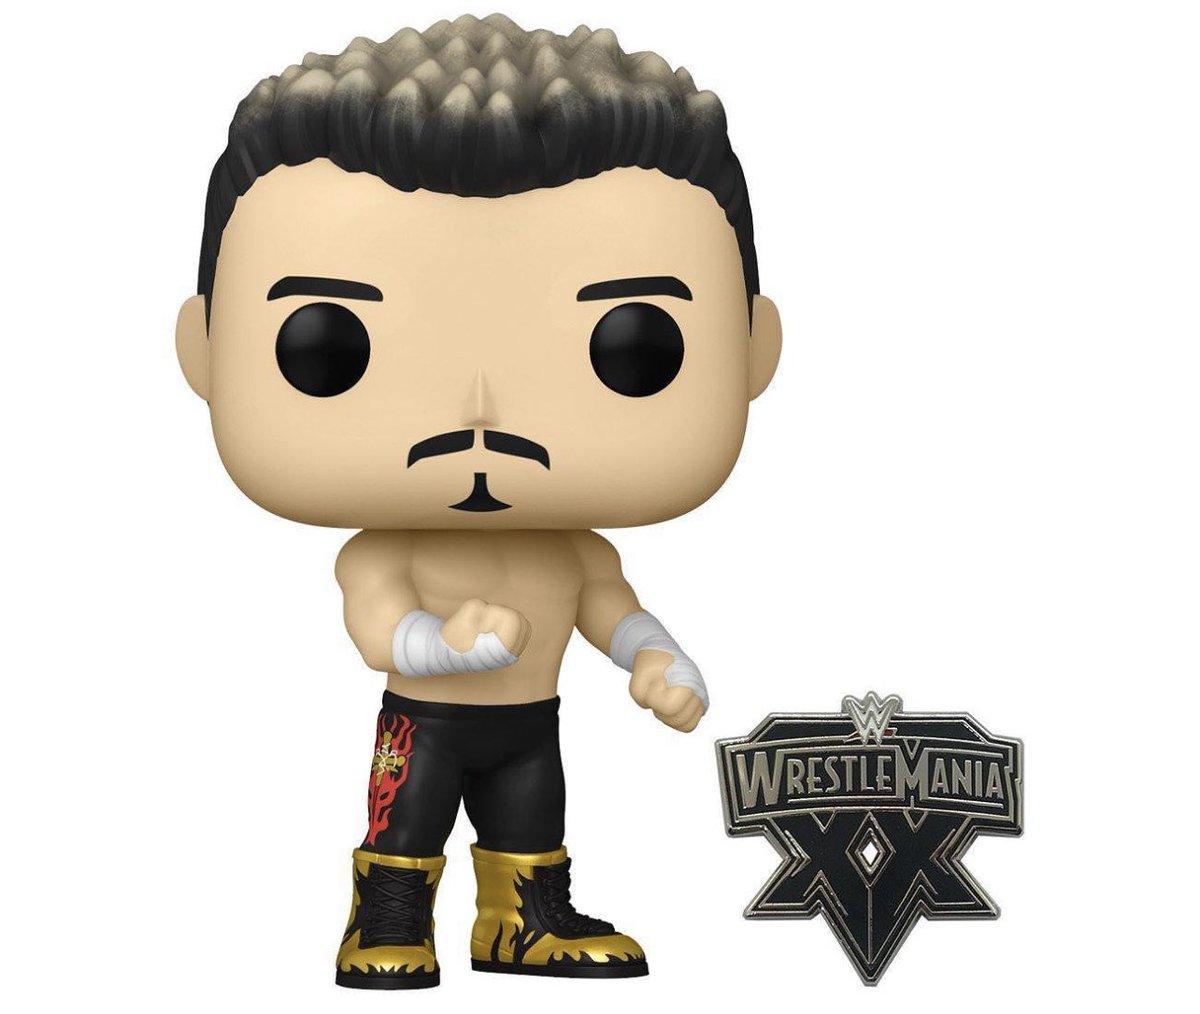 GameStop Exclusive Eddie Guerrero (Wrestlemania) Pop! & Pin is up for preorder #Ad    #WWE #EddieGuerrero #LatinoHeat #Funko #FunkoPop #FunkoFinderz #FunkoFair